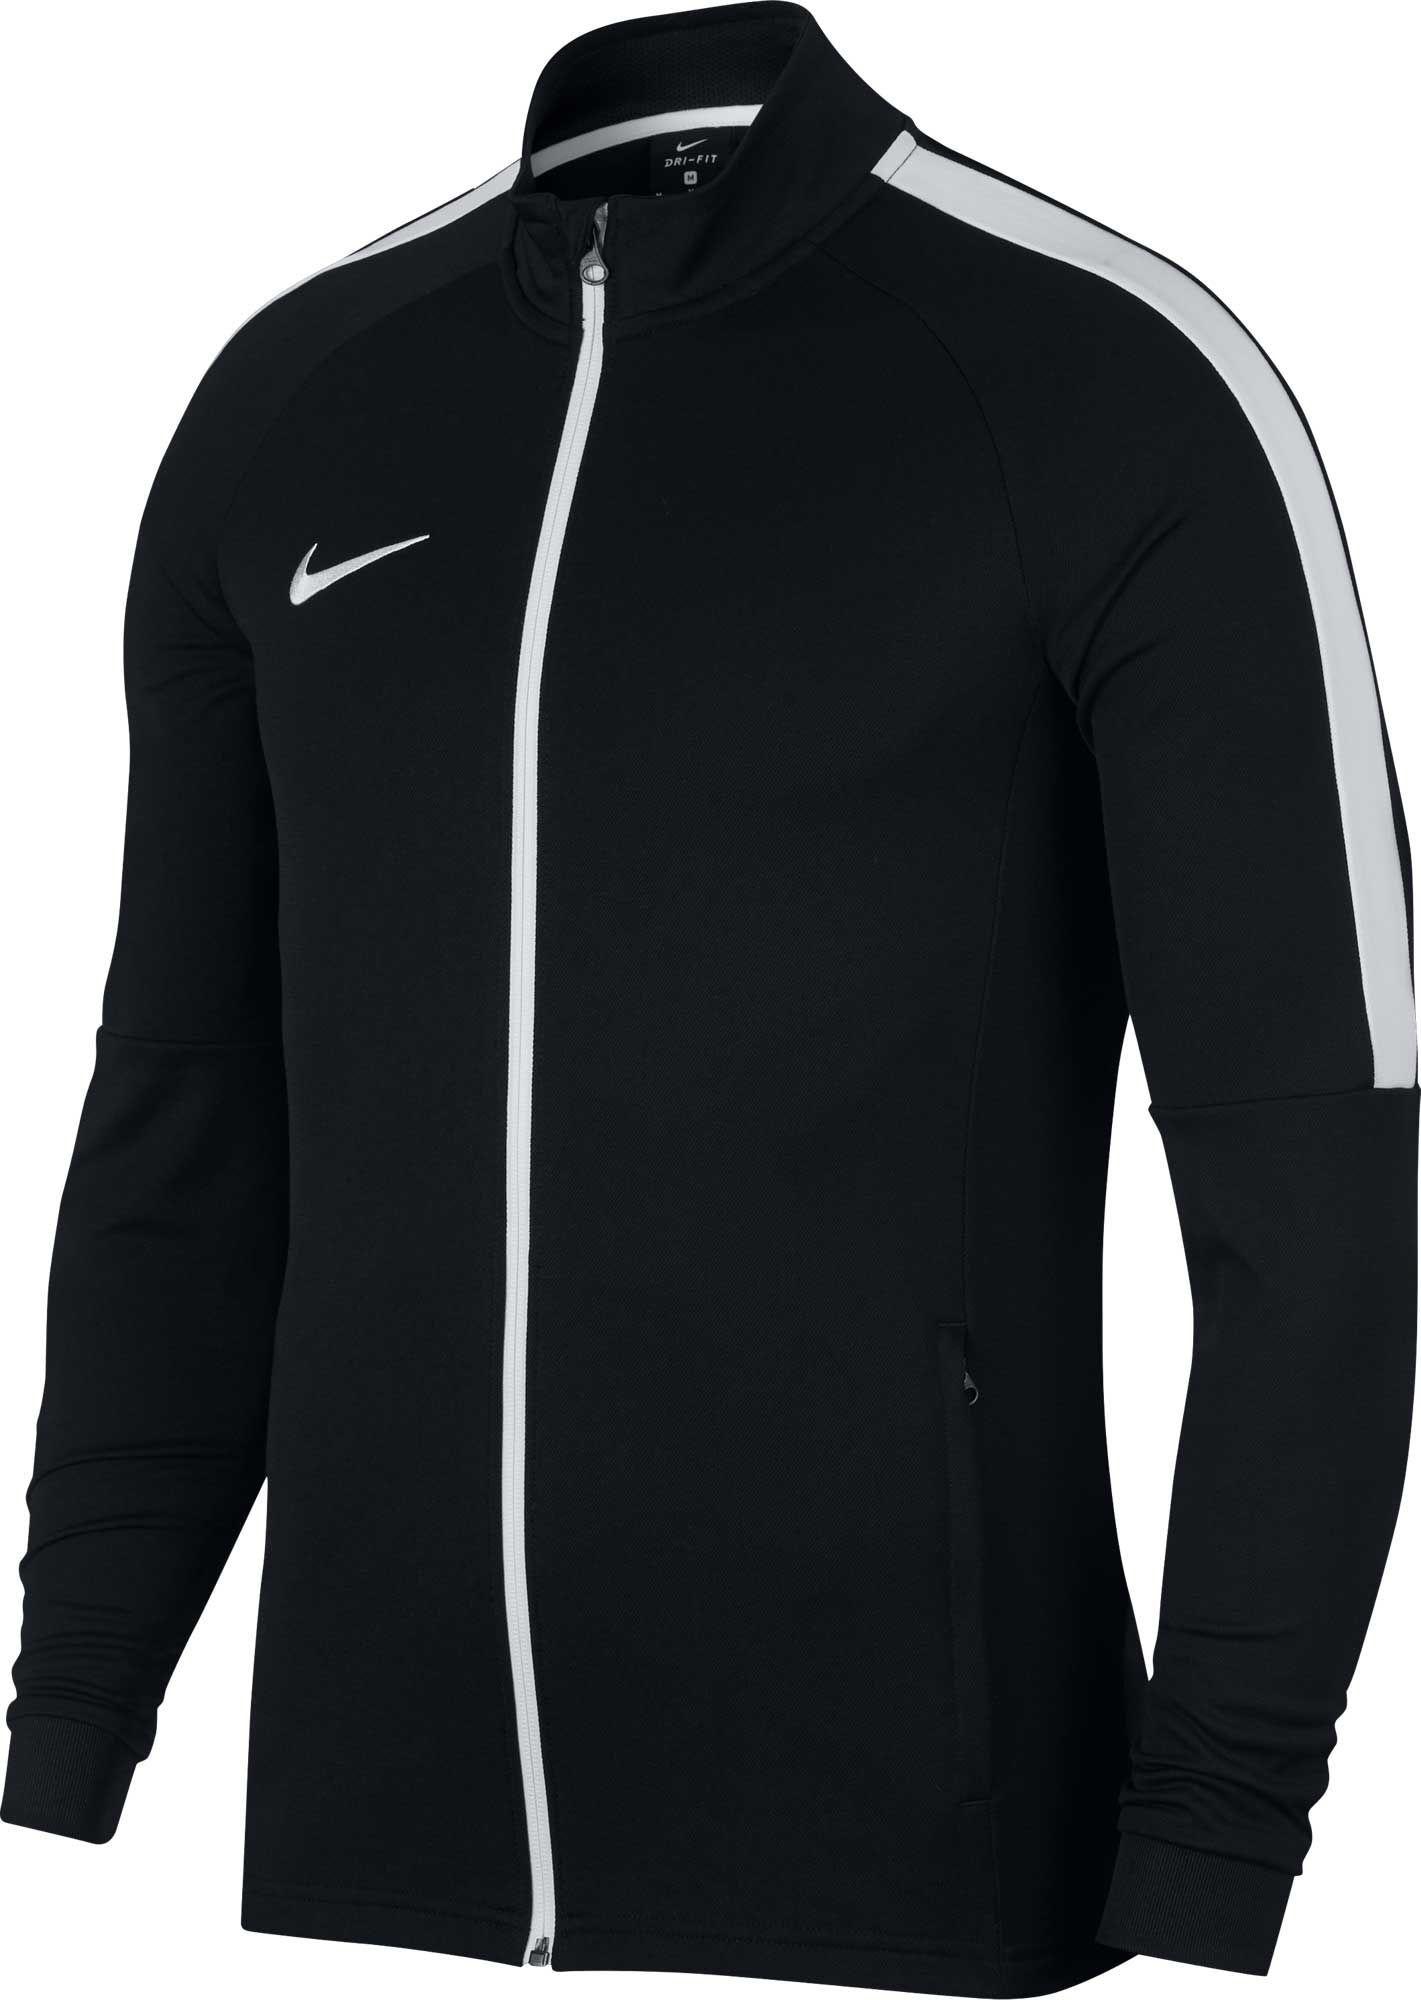 aff54b0163 Nike Men s Dry Academy Track Jacket